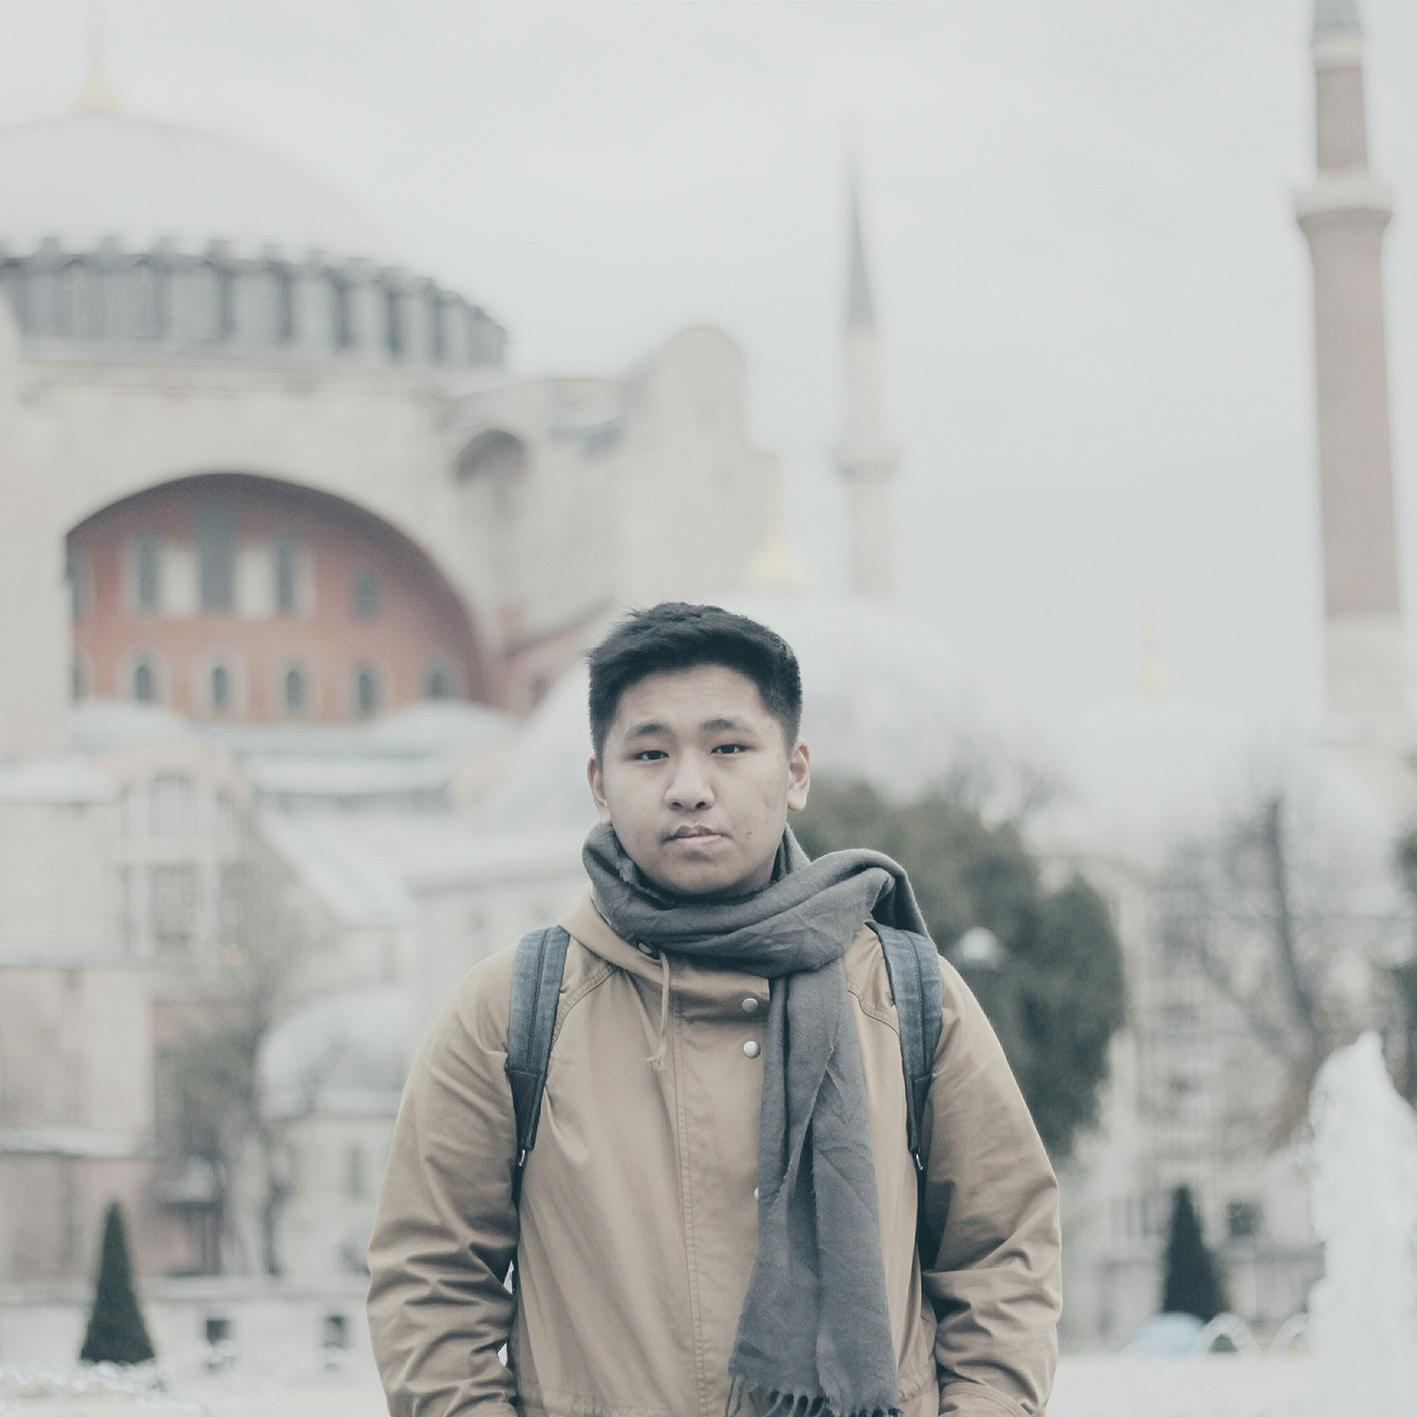 Go to yonatan anugerah's profile